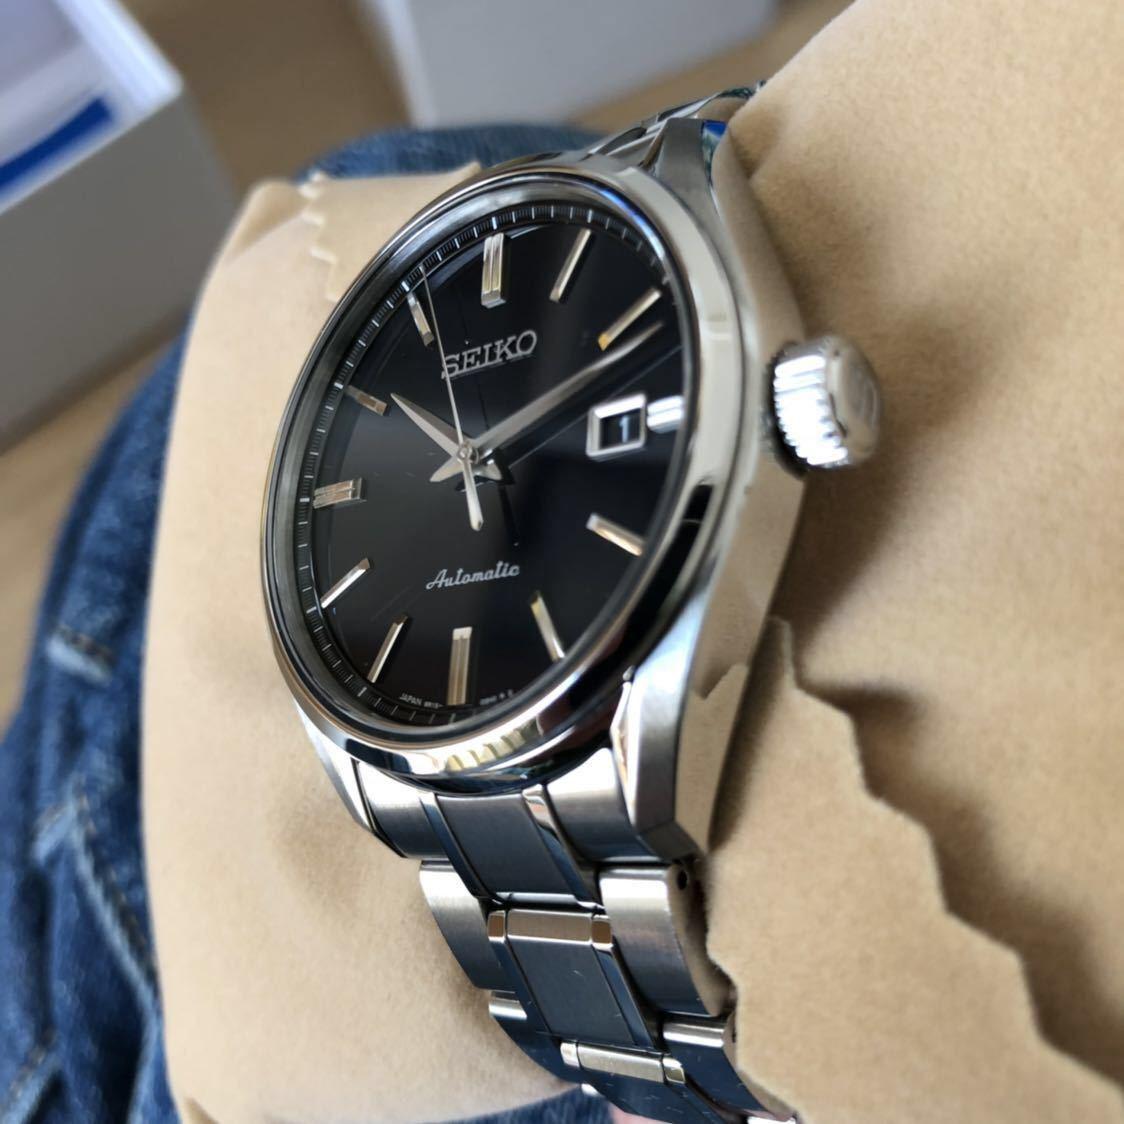 SEIKO PRESAGE SARX035 セイコー プレザージュ 機械式 メカニカル 腕時計 自動巻_画像5